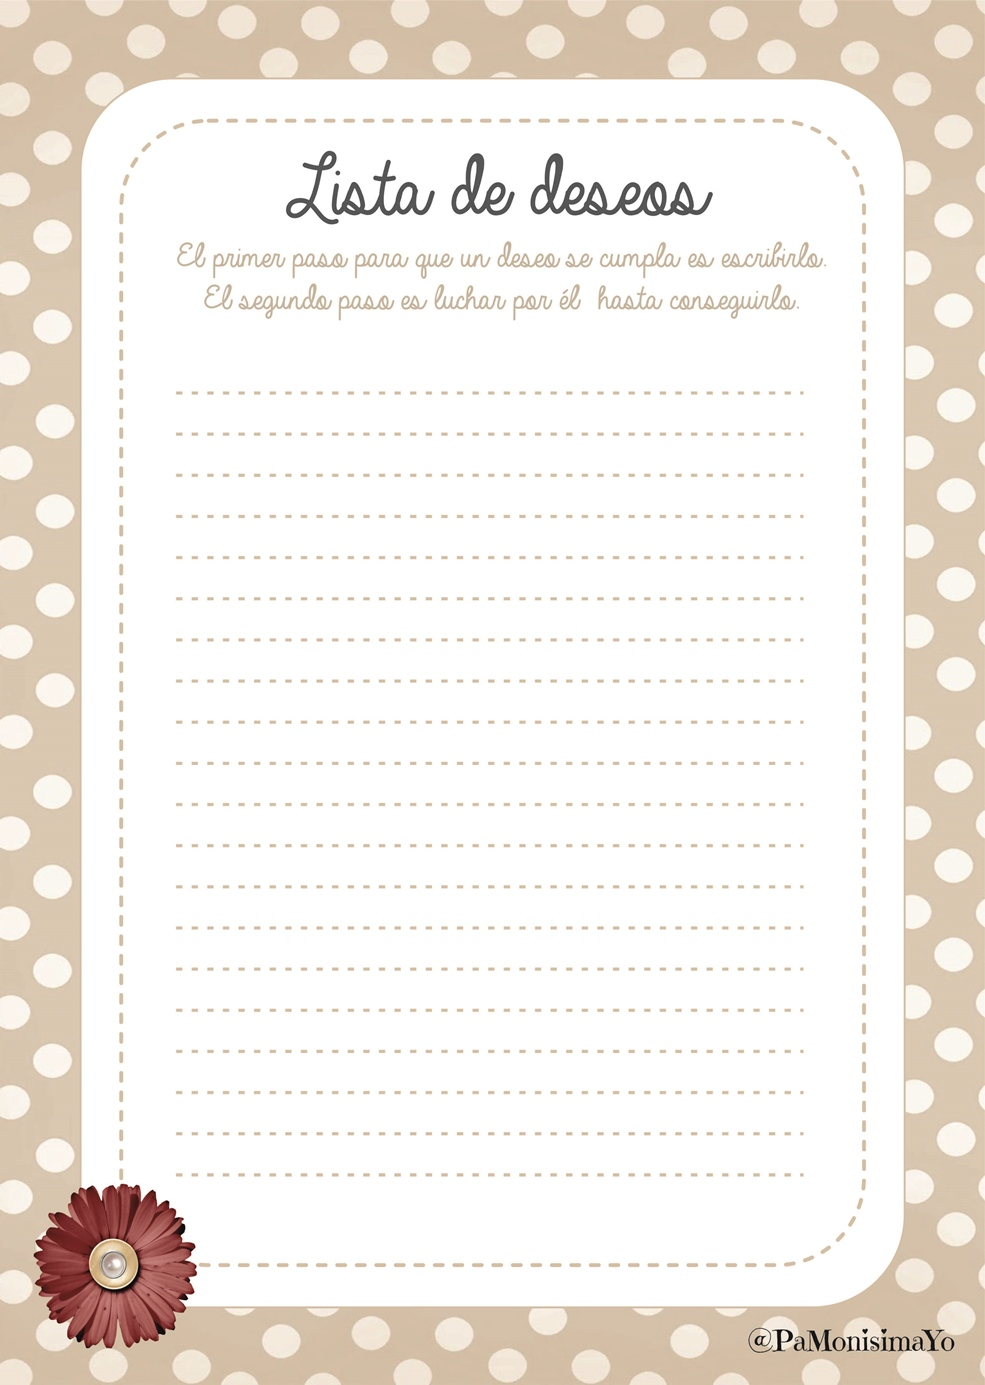 Lista de deseos wishlist @pamonisimayo